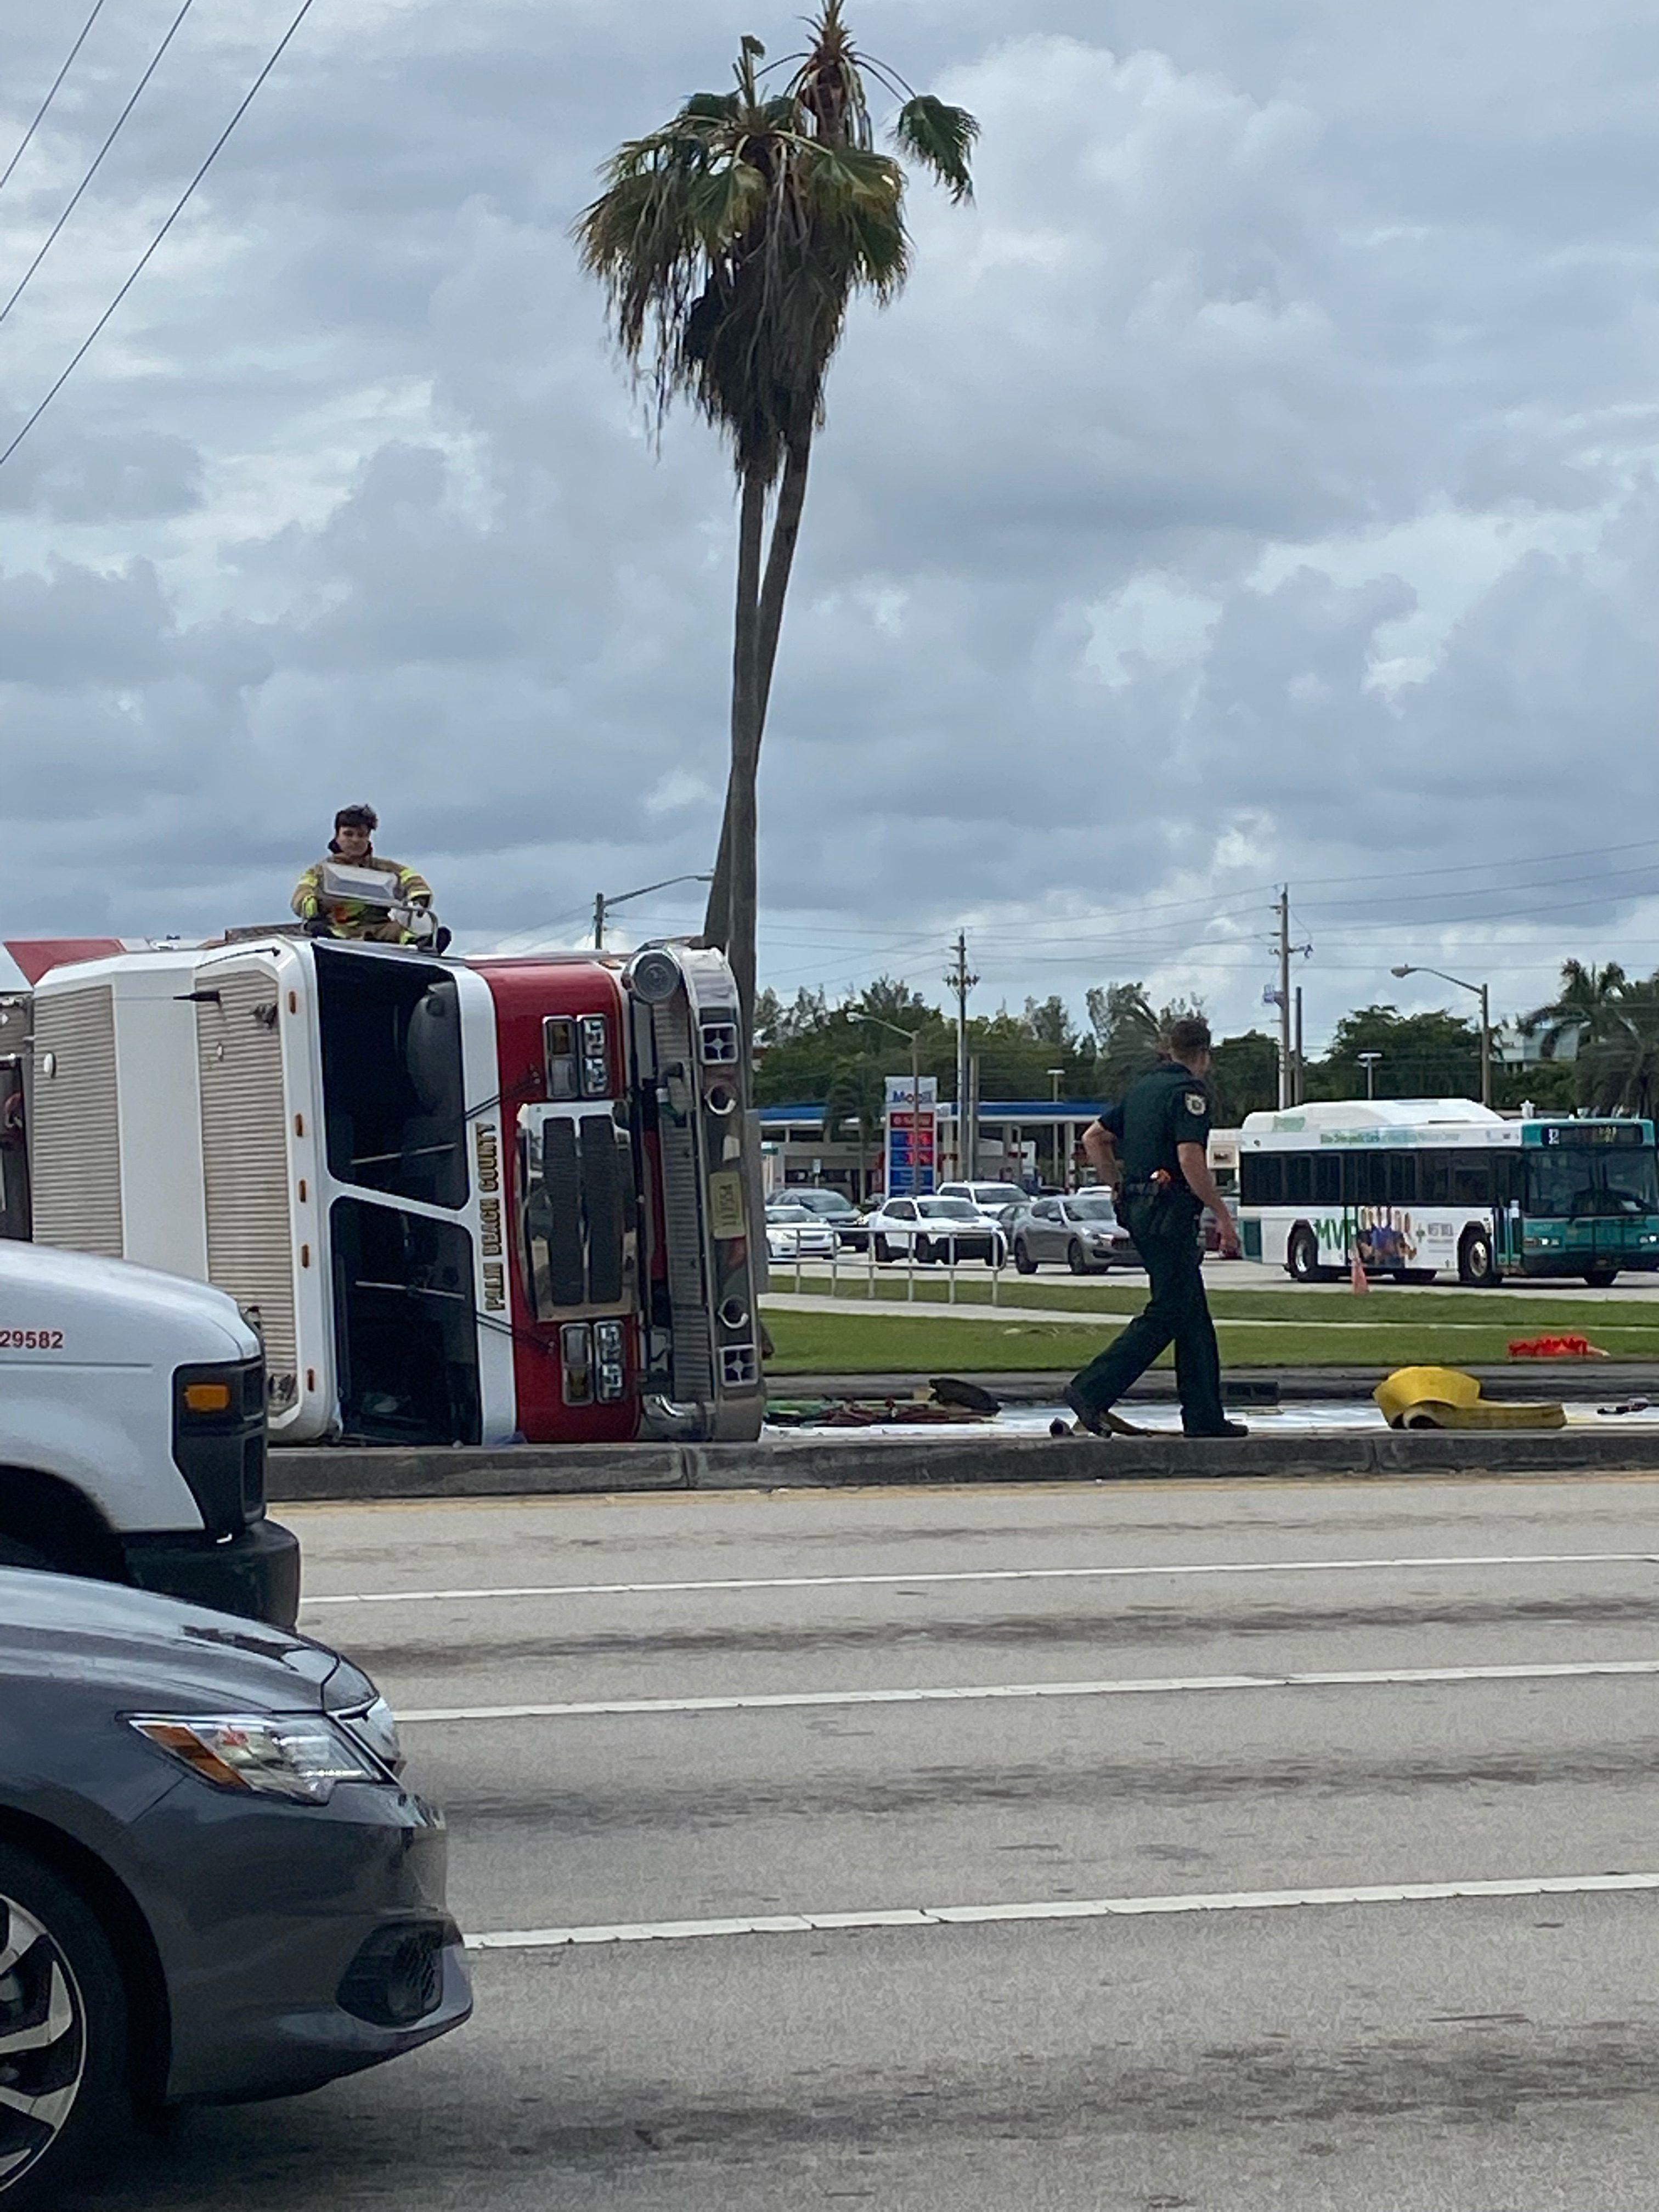 Flipped Fire Truck